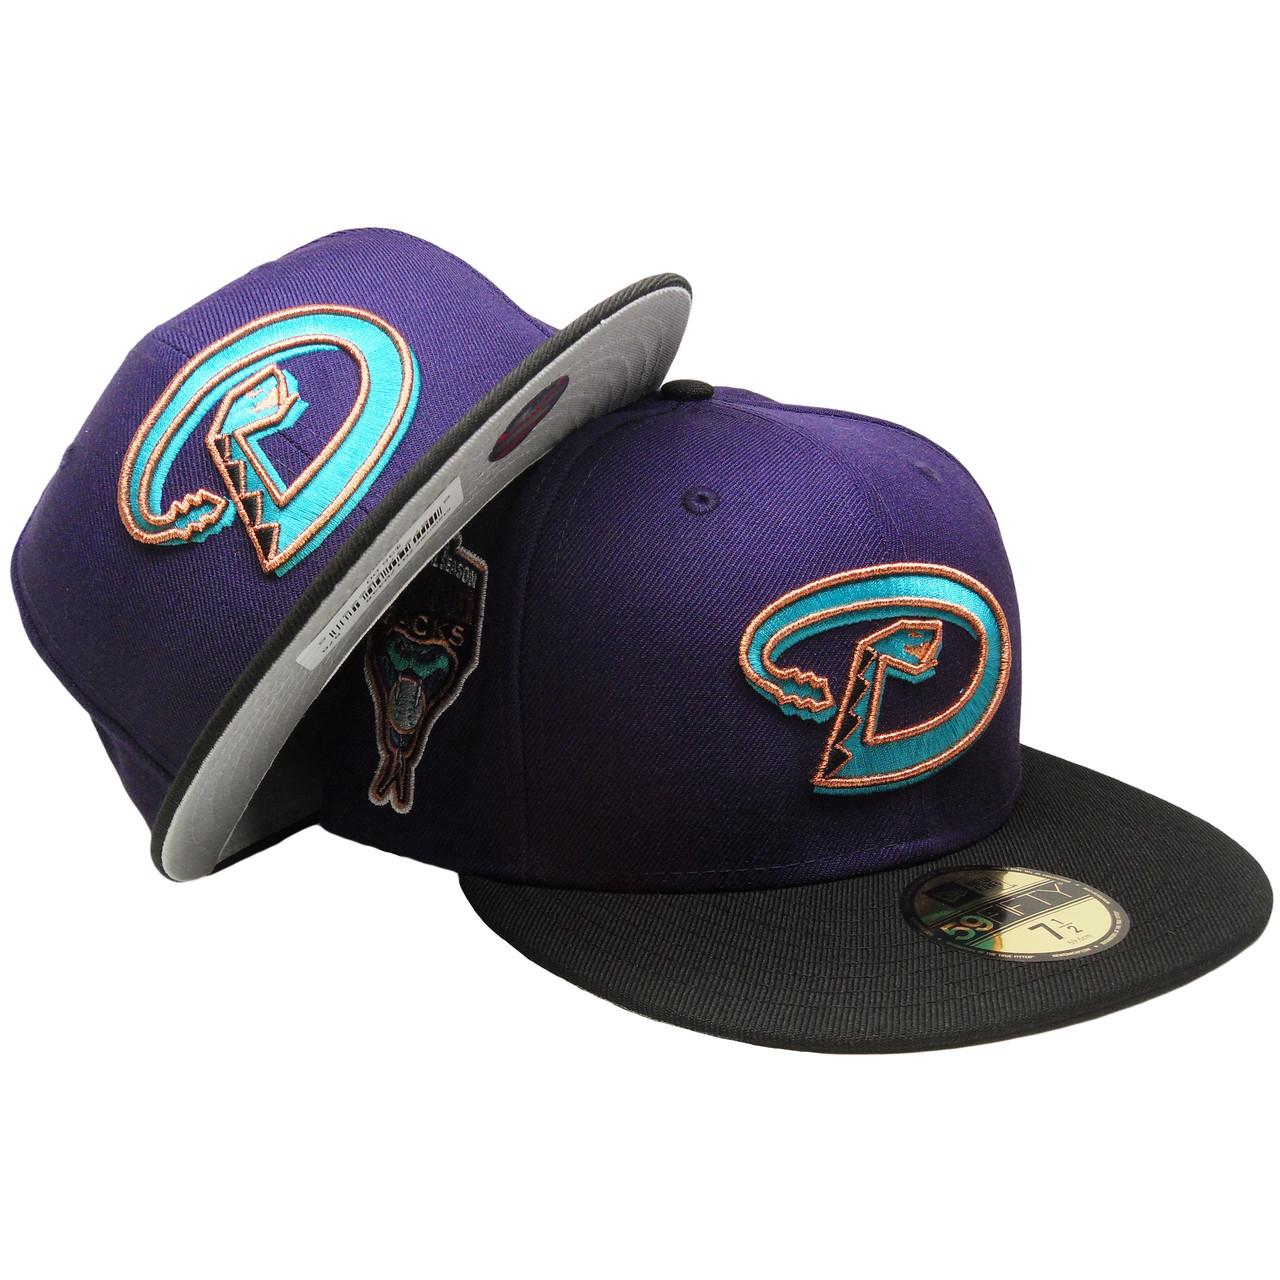 b67b6983 Arizona Diamondbacks Custom New Era Fitted - Purple, Black, Teal, Copper